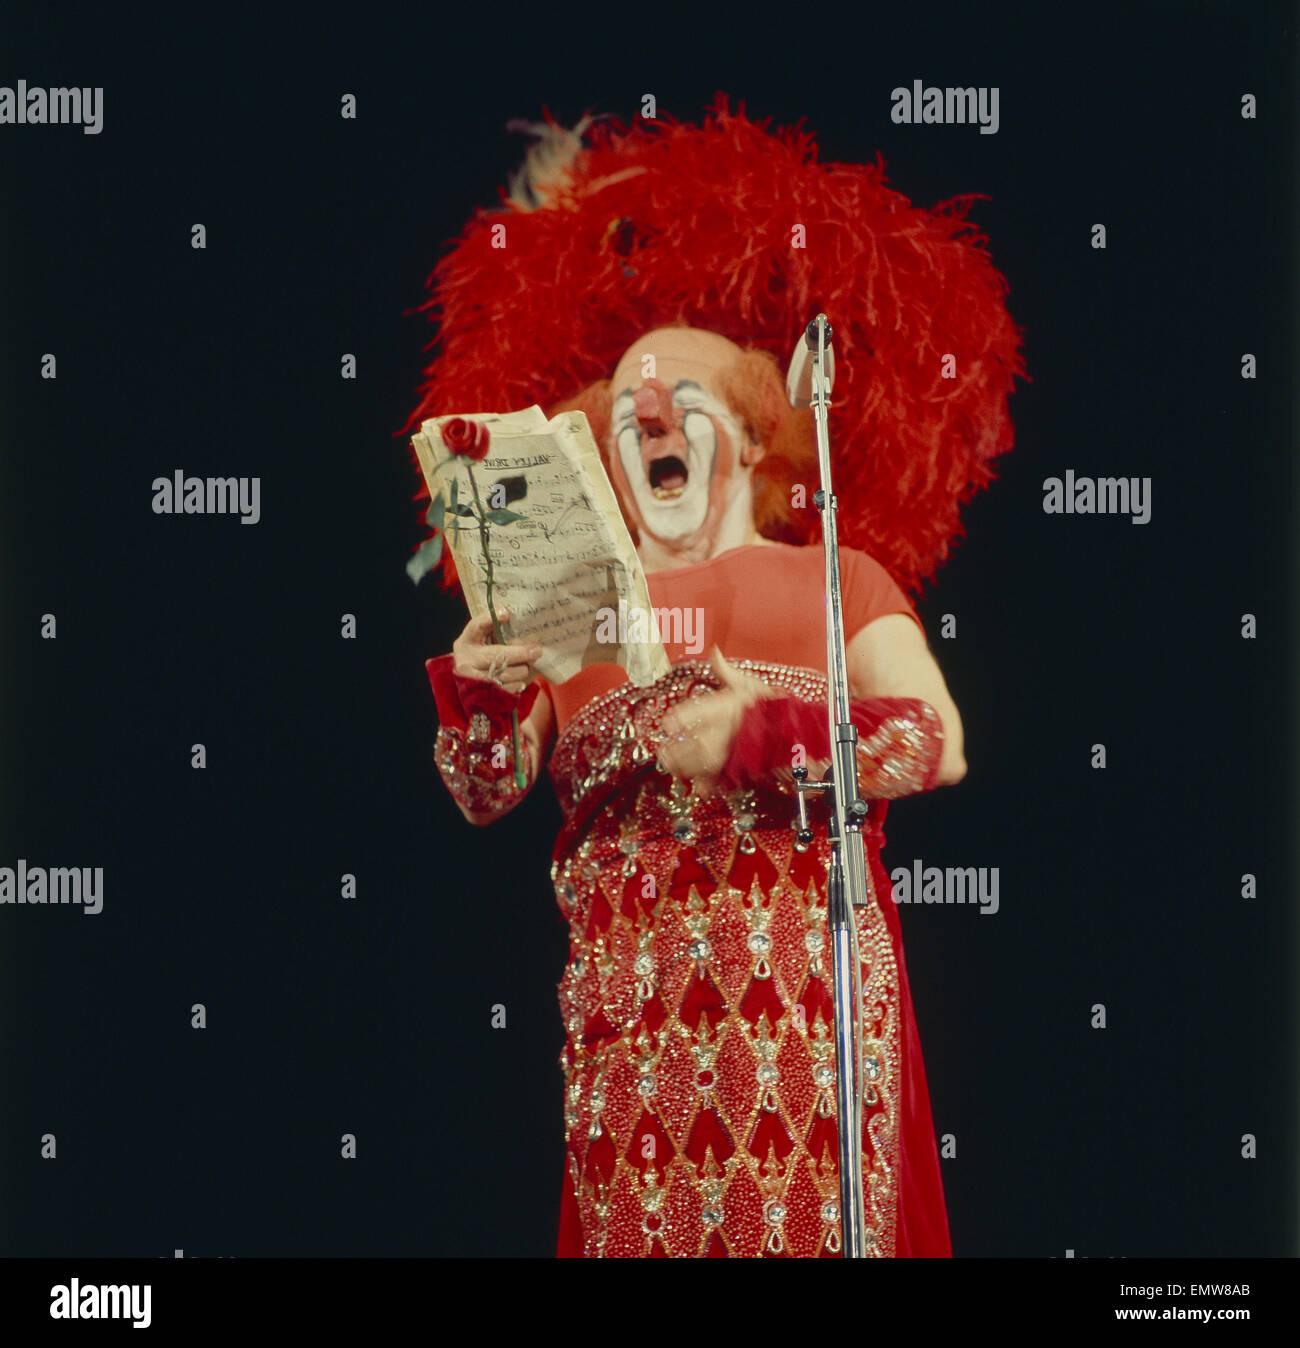 Serie: Akrobat Schööön!, Charlie Rivel Mit Seiner Berühmten Opernarie Stockbild